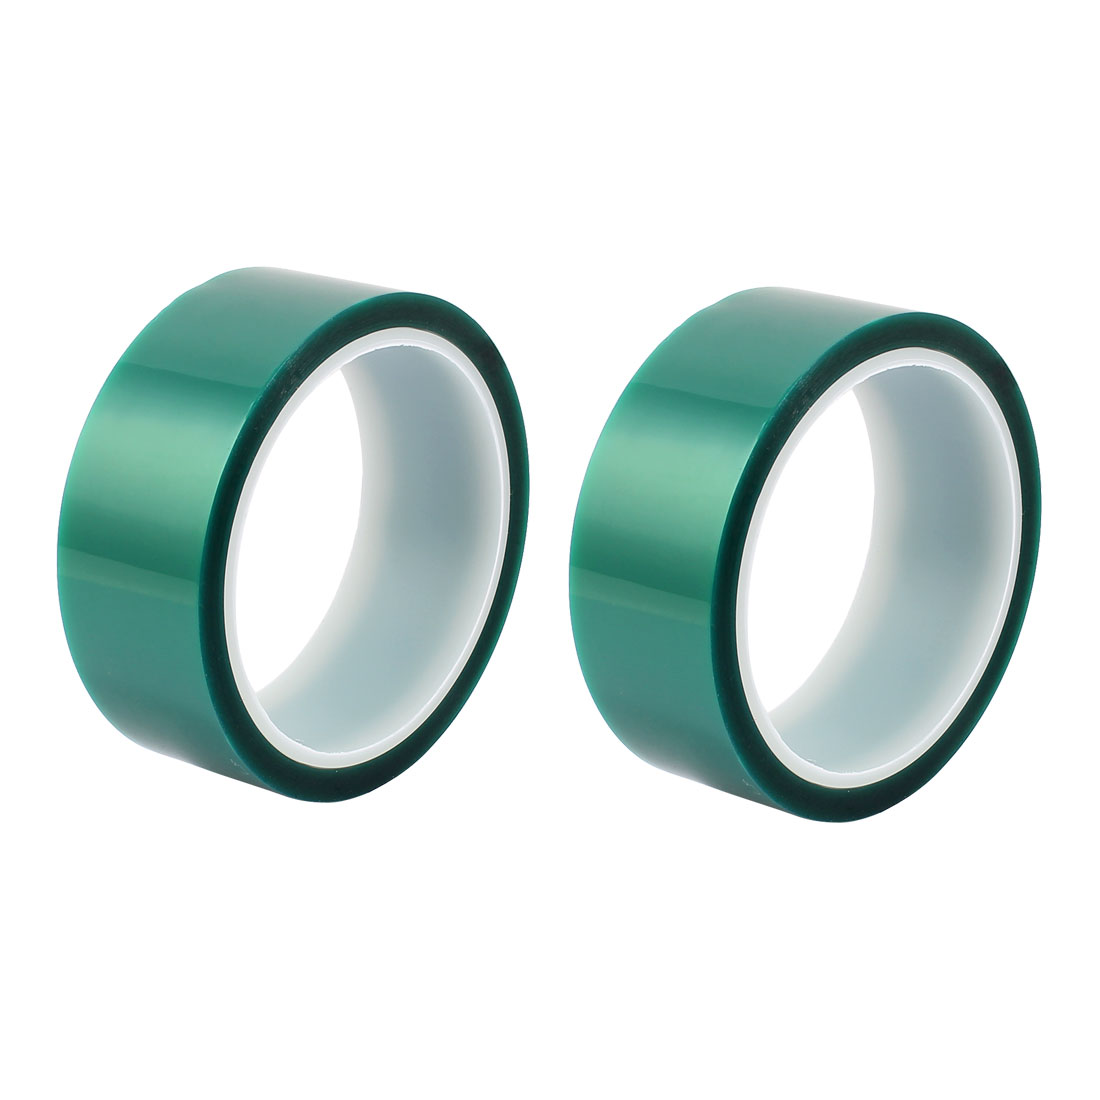 2pcs 35mm Width 33M Long Green PET High Temperature Heat Resistant PCB Solder Tape